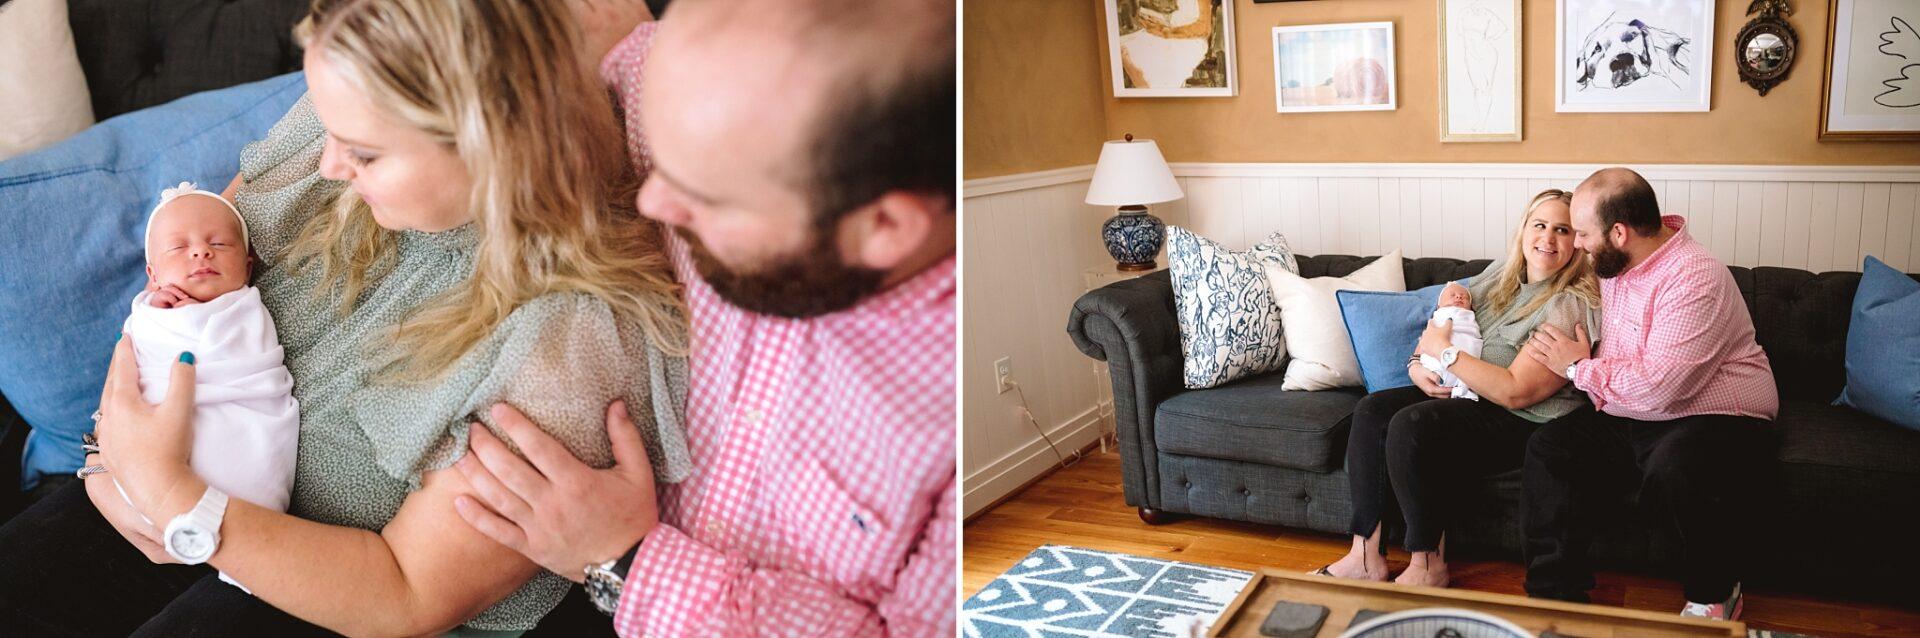 in-home lifestyle newborn session - dc md va newborn photographer